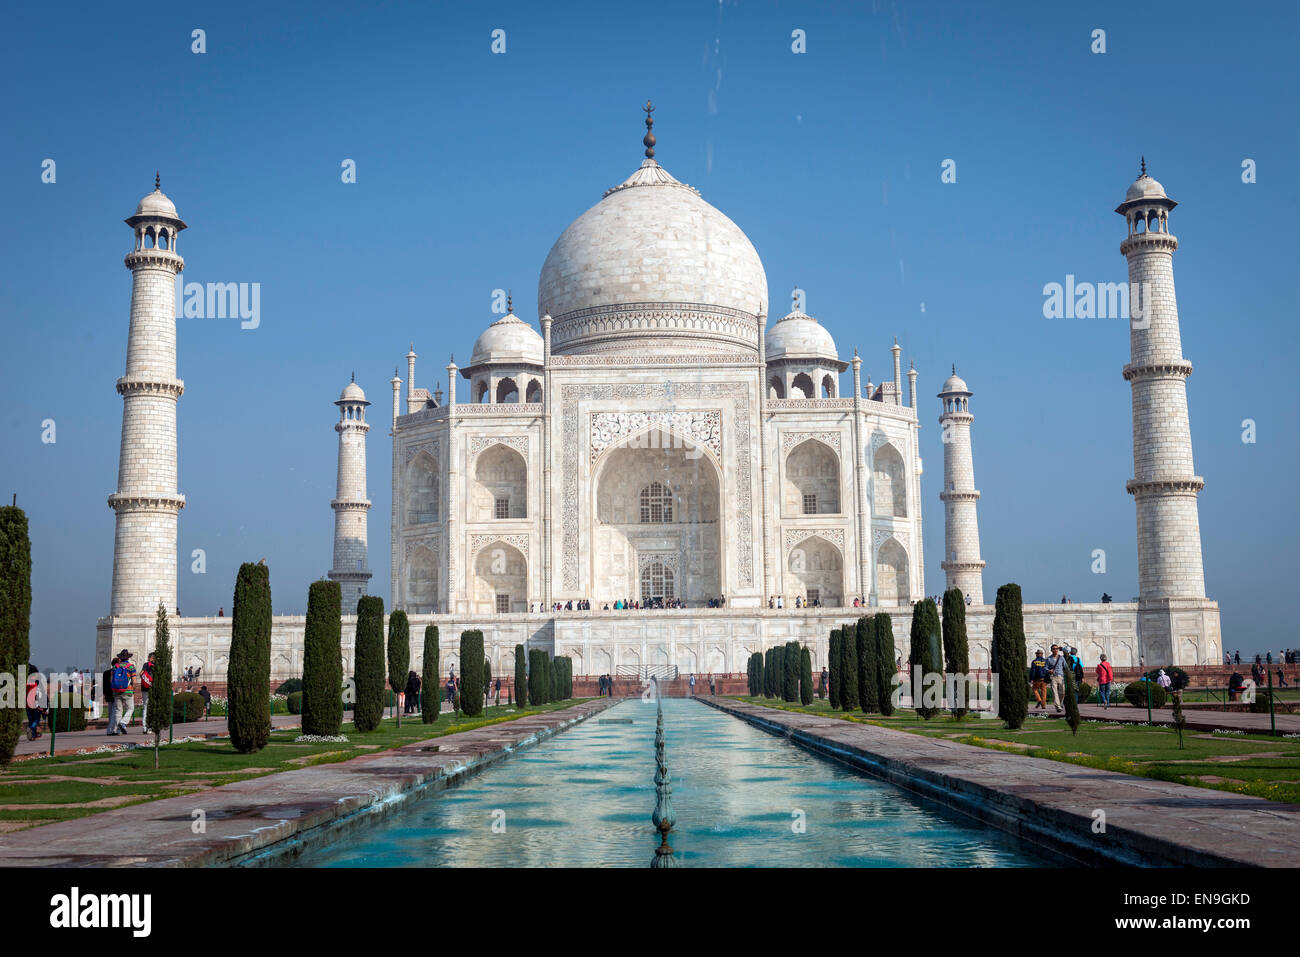 El Taj Mahal, en Agra, India Imagen De Stock